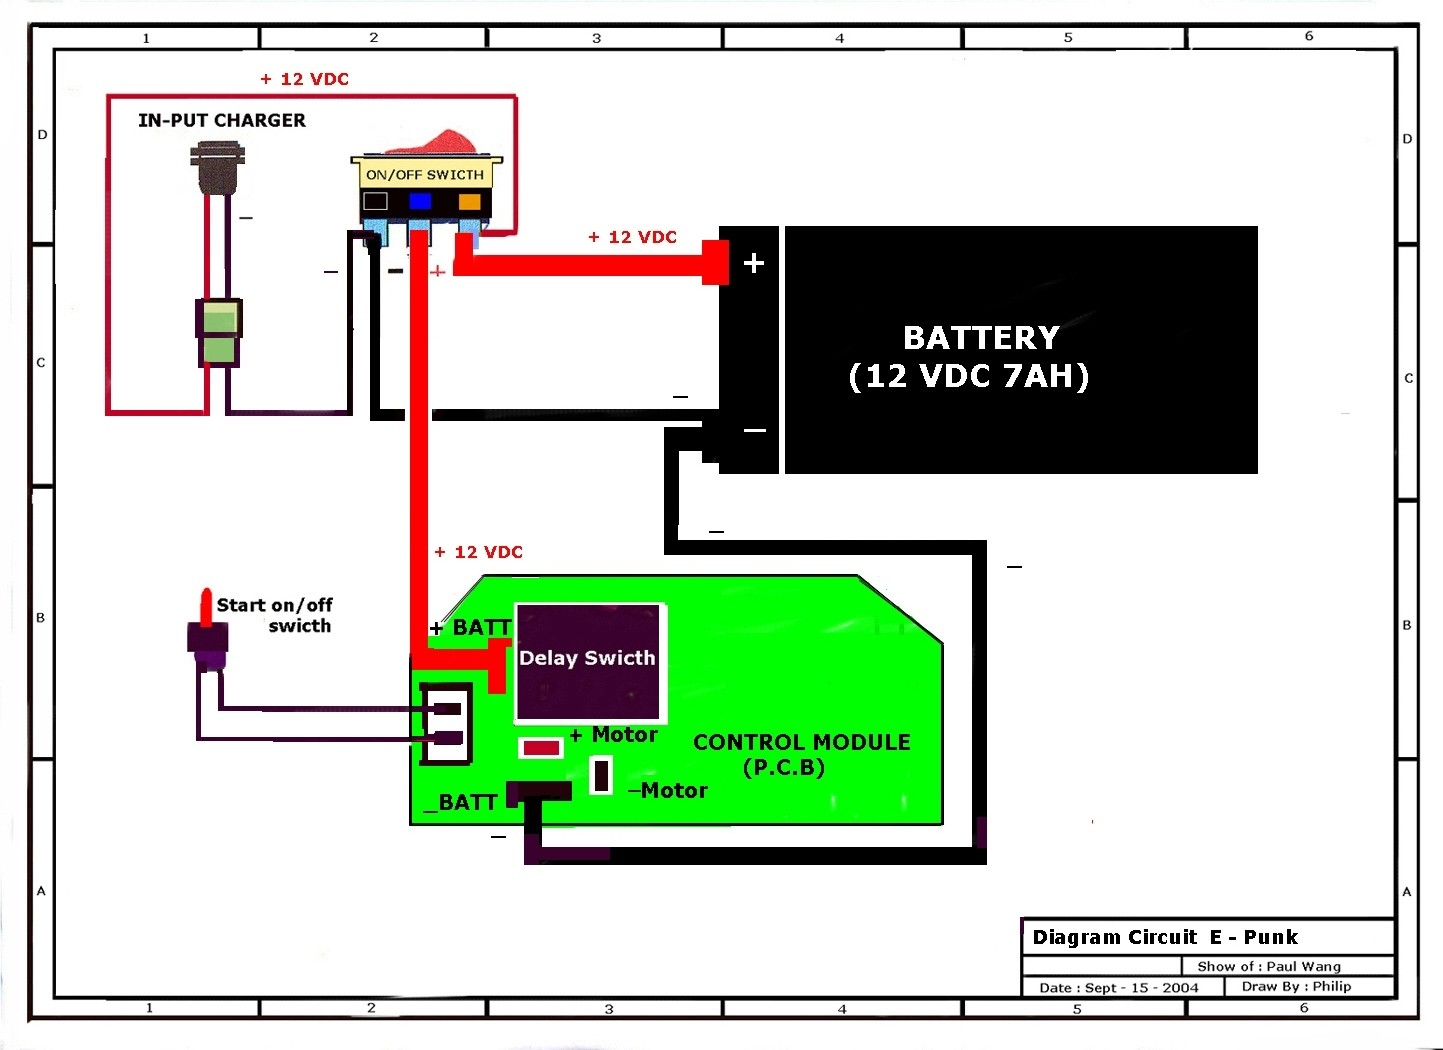 motorized bicycle wiring diagram wiring diagram image rh mainetreasurechest com motorized bike wiring diagram 80cc motorized bicycle wiring diagram